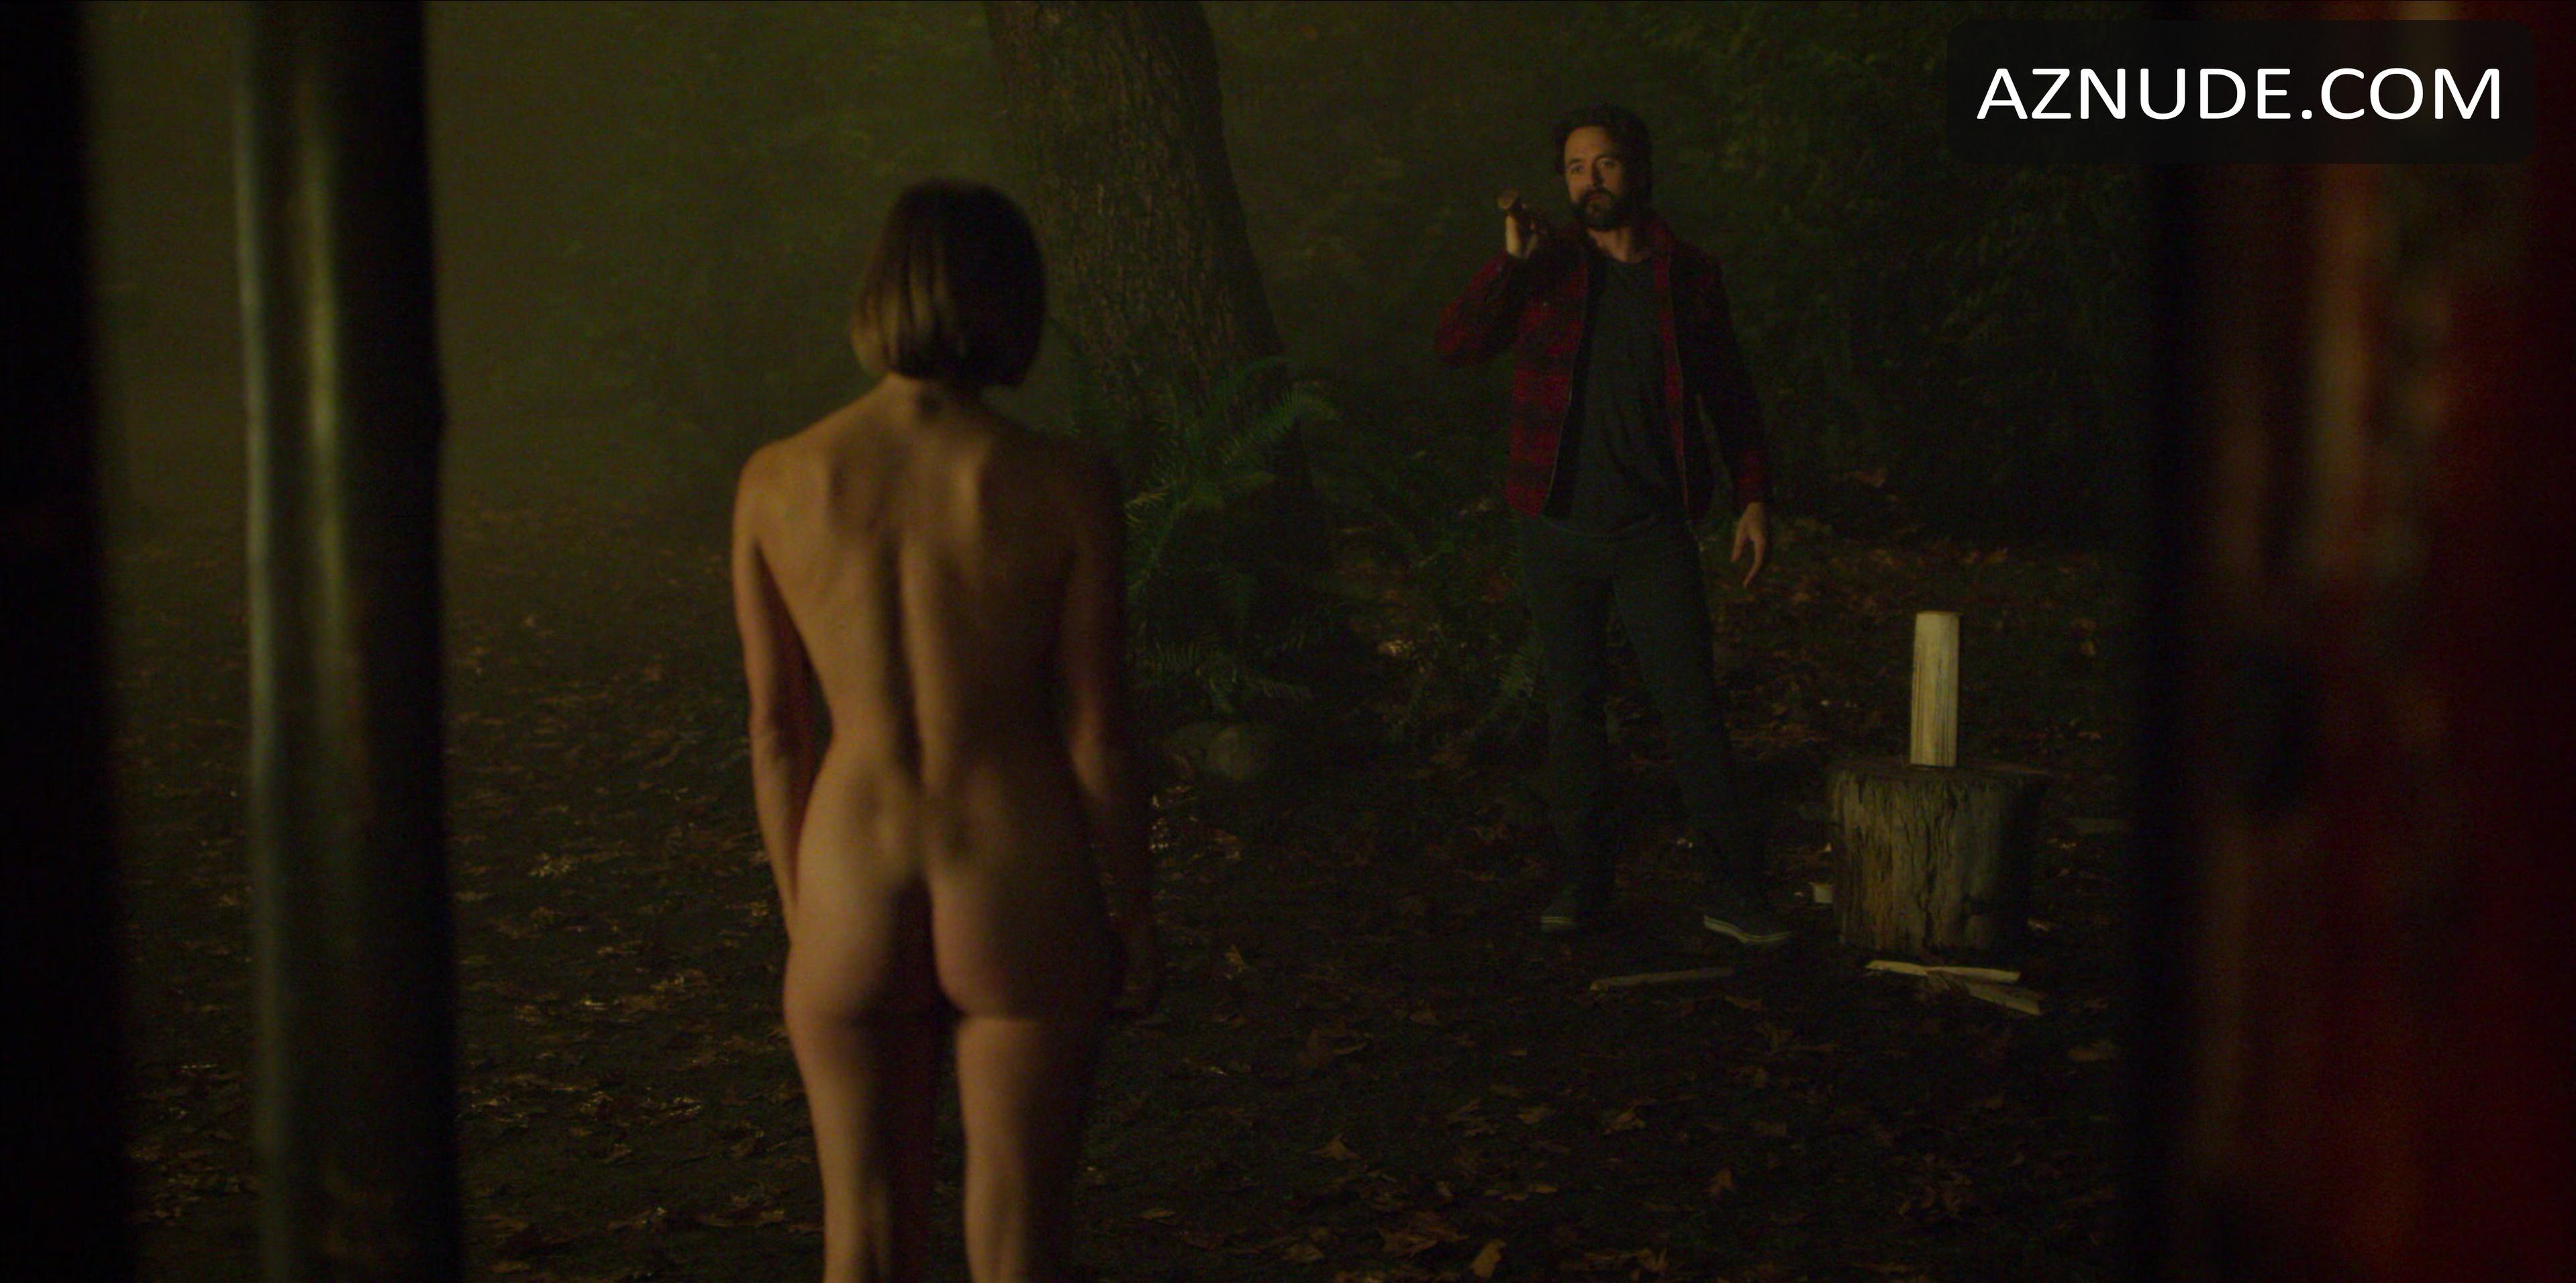 Another Life Nude Scenes - Aznude-3282